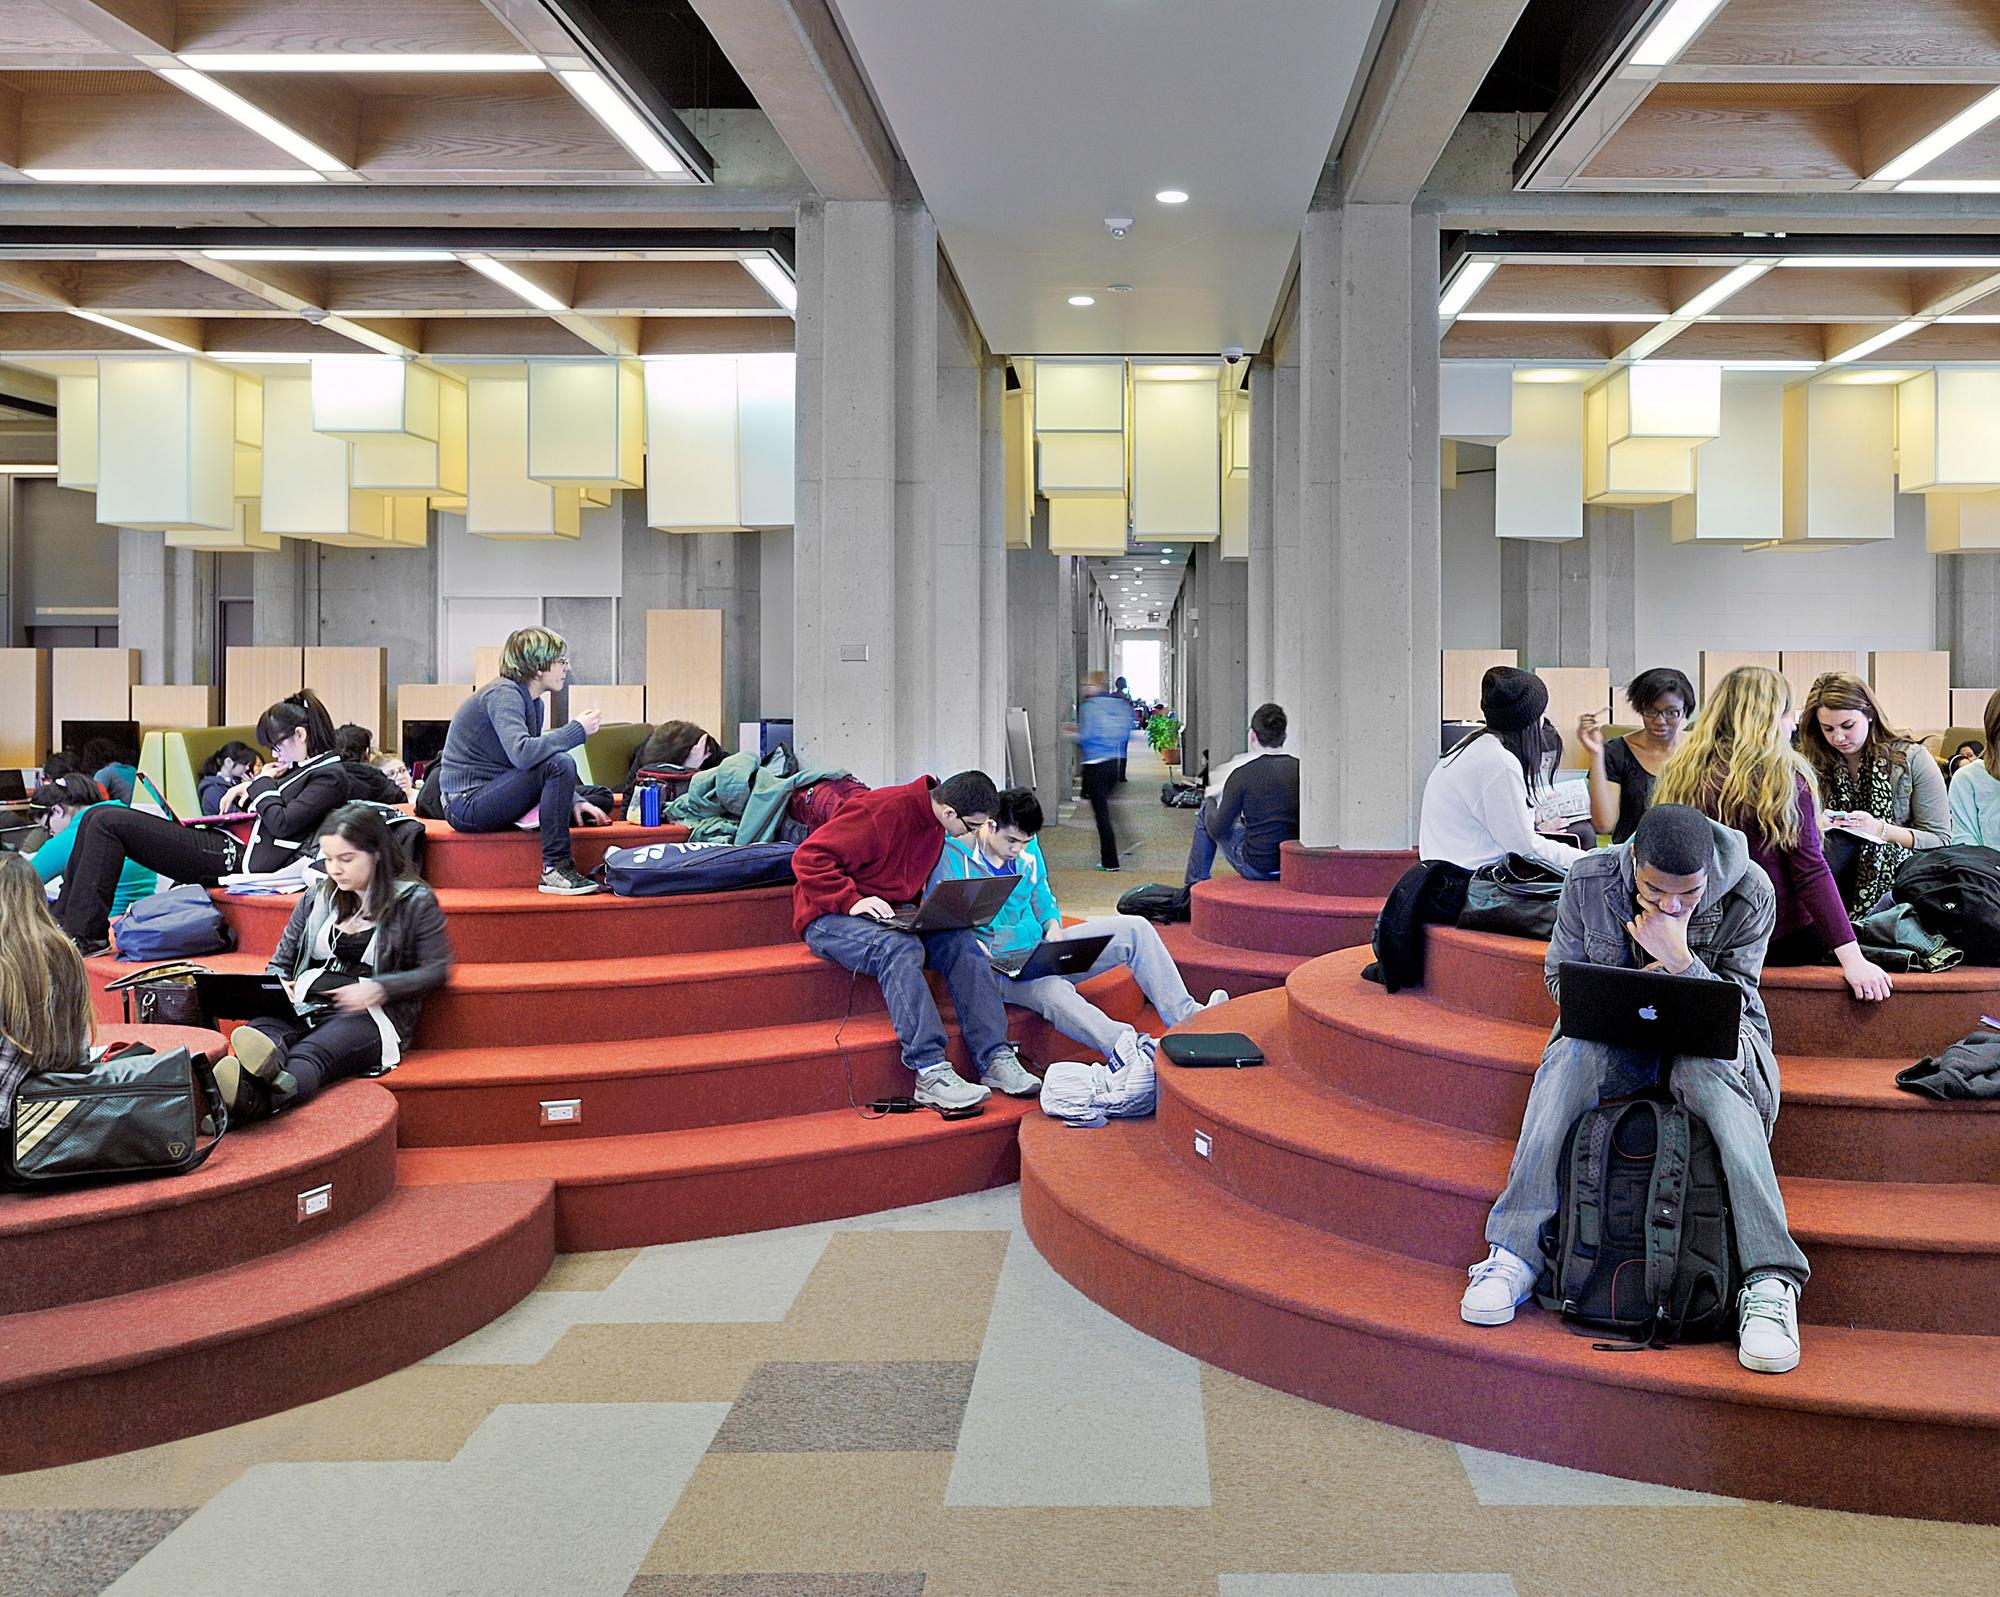 York University Learning Commons / Levitt Goodman Architects, © Bob Gundu